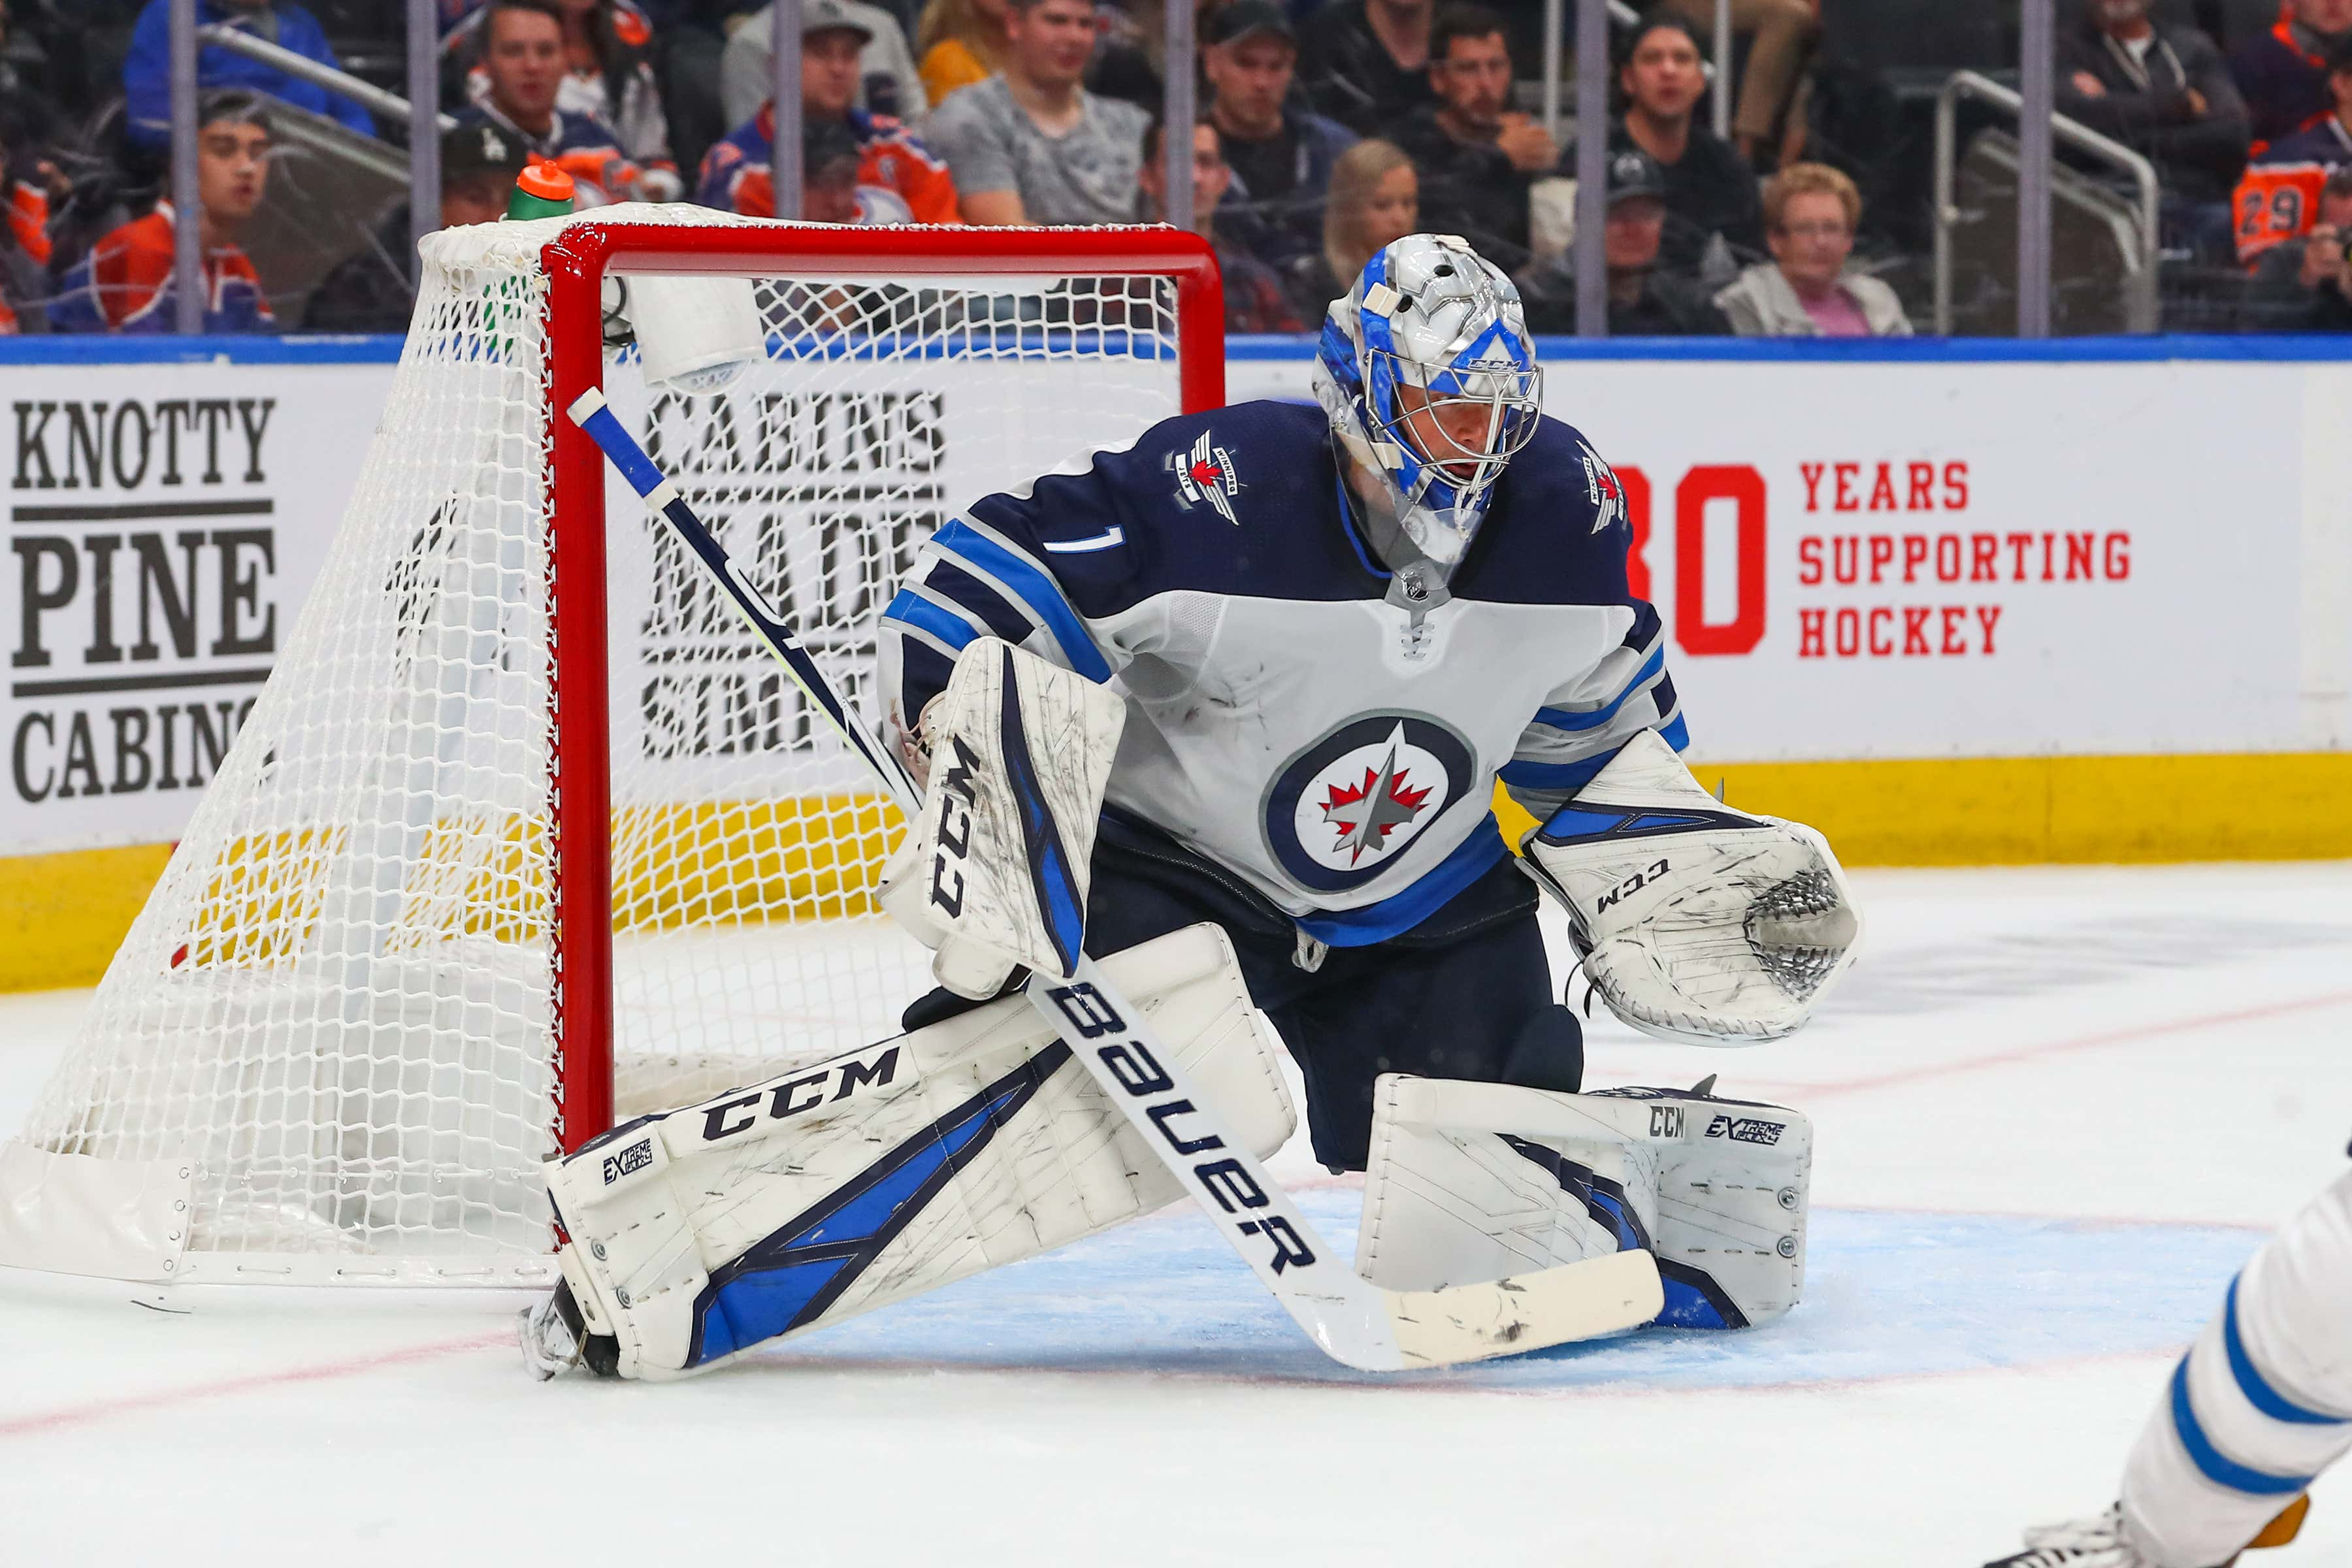 NHL: SEP 16 Jets at Oilers